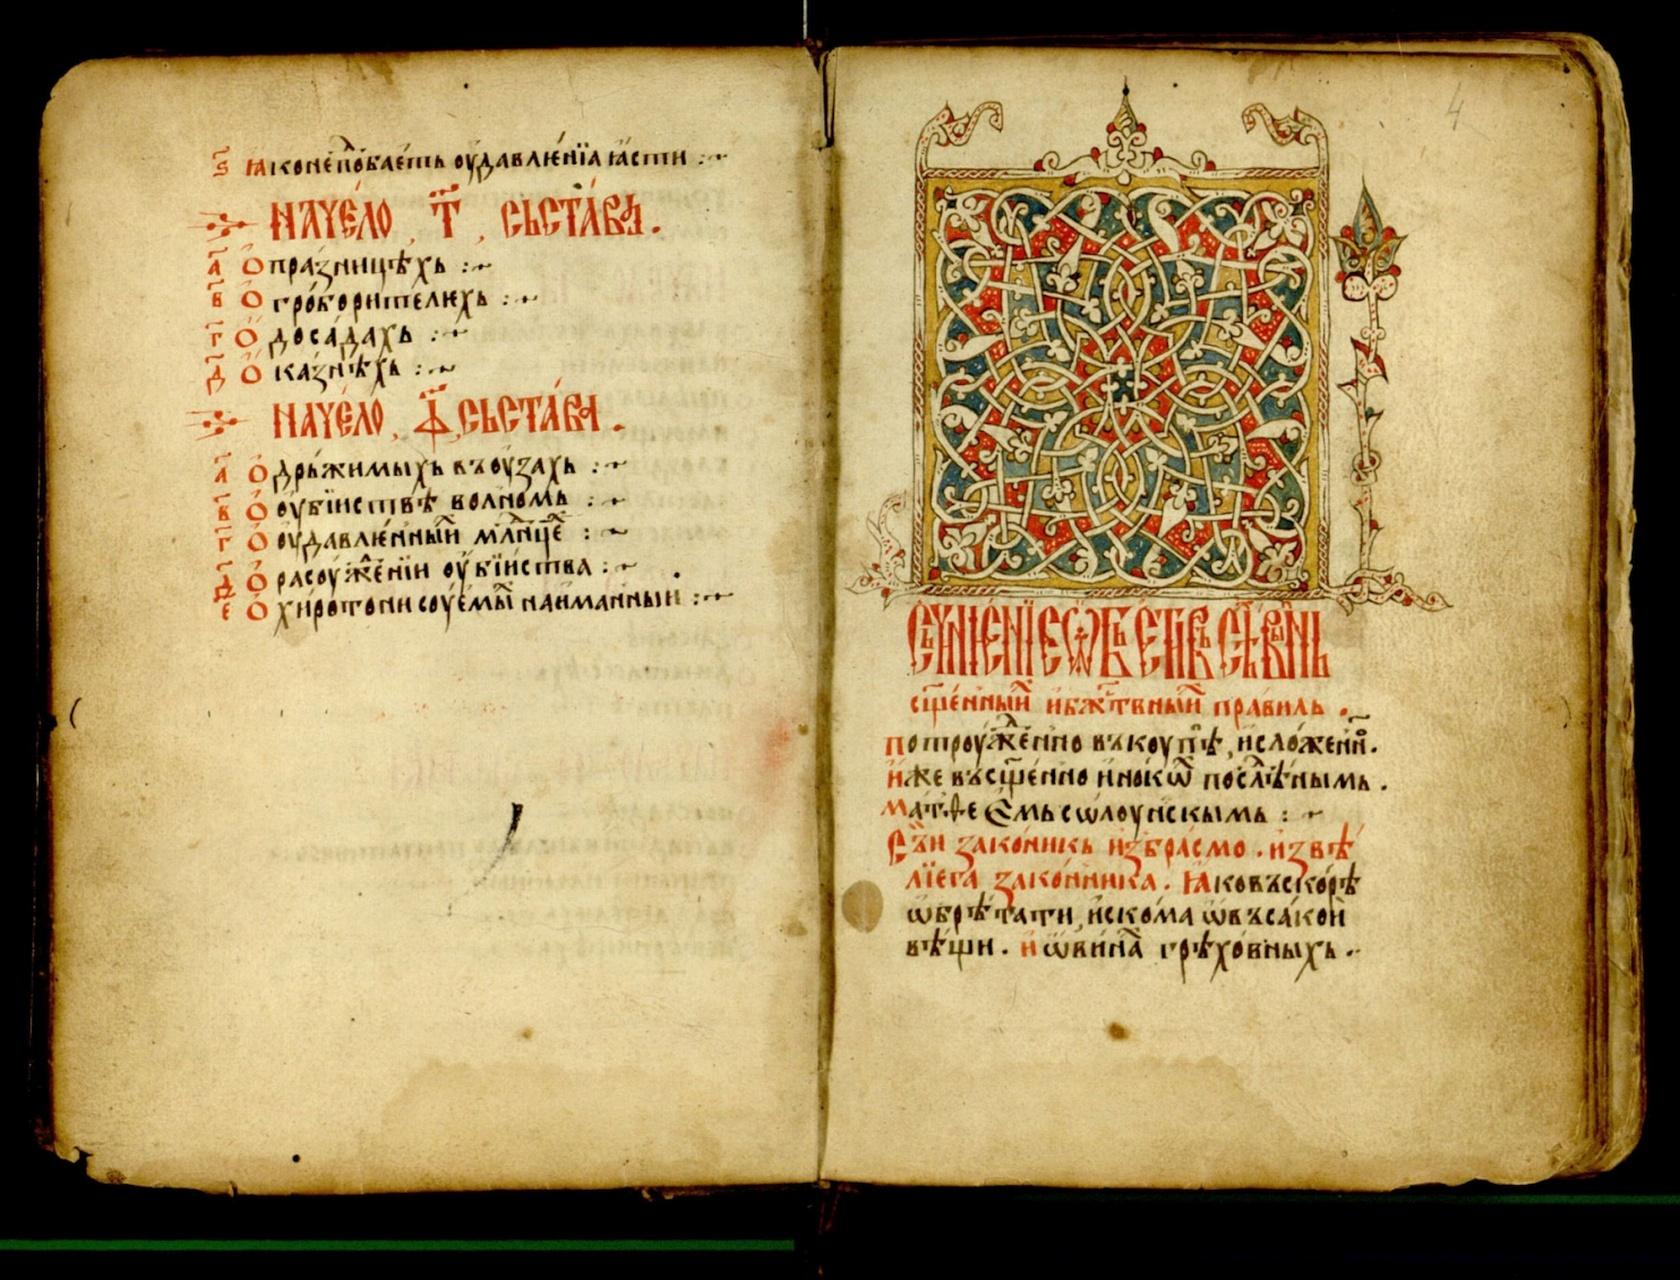 https://upload.wikimedia.org/wikipedia/commons/b/b9/Du%C5%A1an%27s_Code%2C_Prizren_manuscript%2C_15th_c.jpg